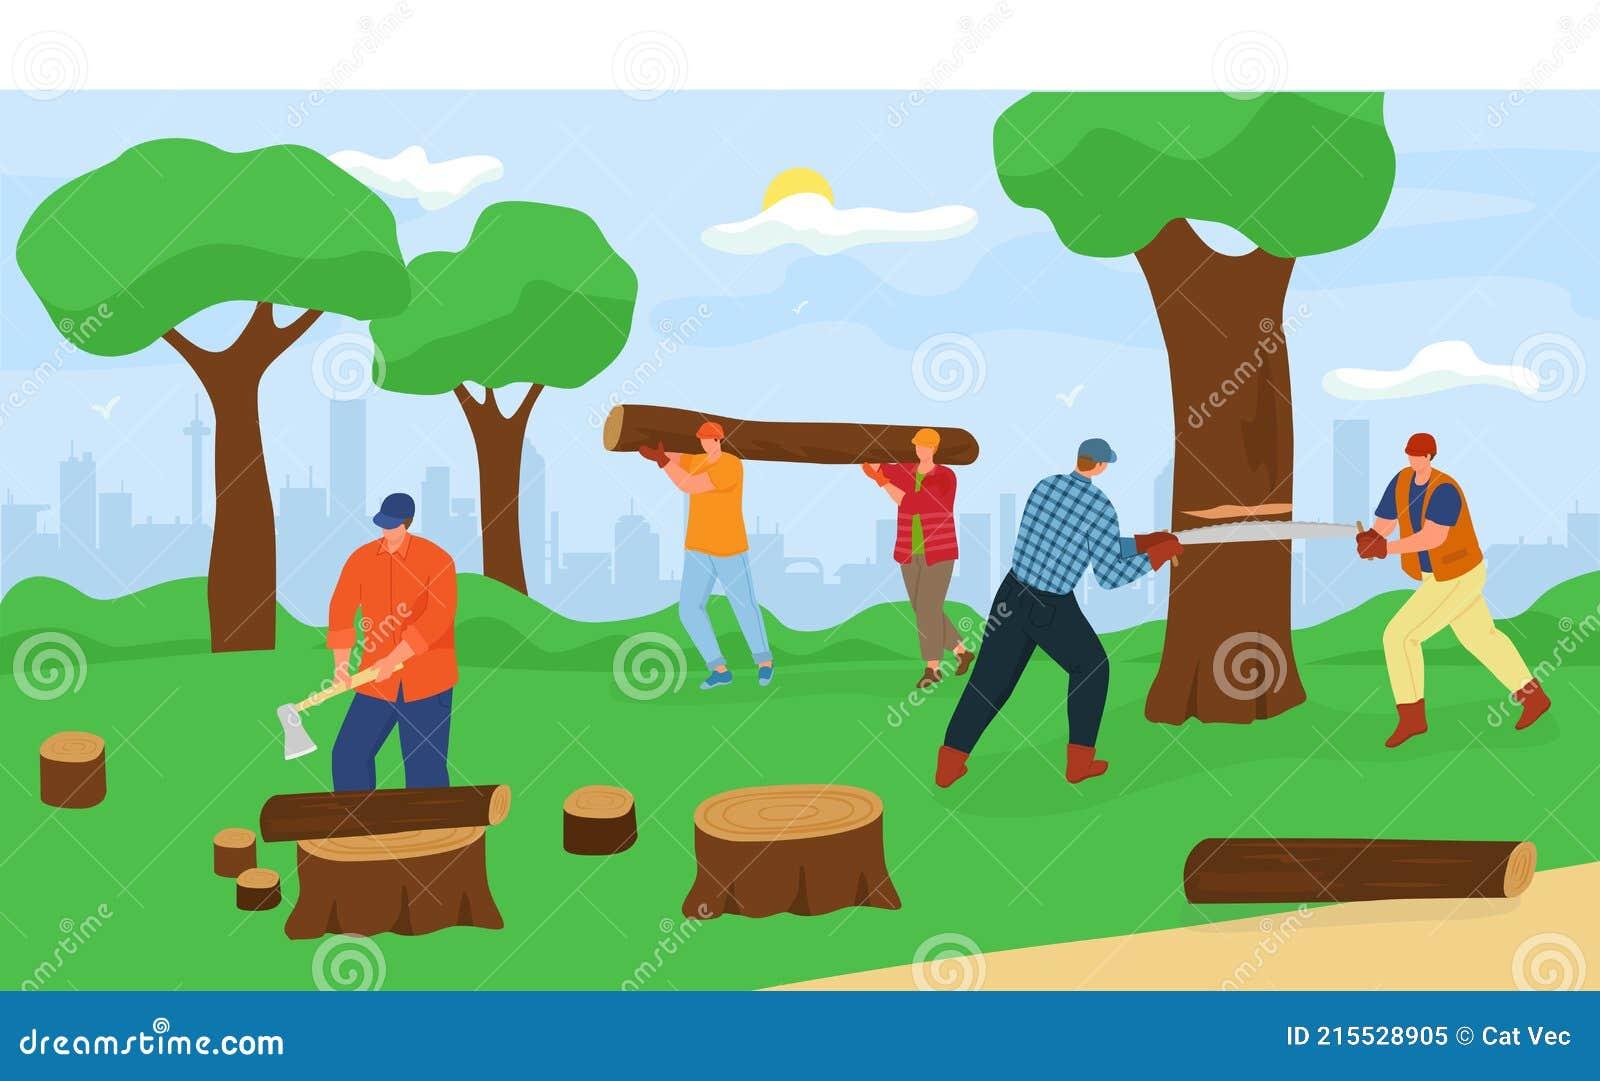 Man Cutting Tree Stock Illustrations 662 Man Cutting Tree Stock Illustrations Vectors Clipart Dreamstime